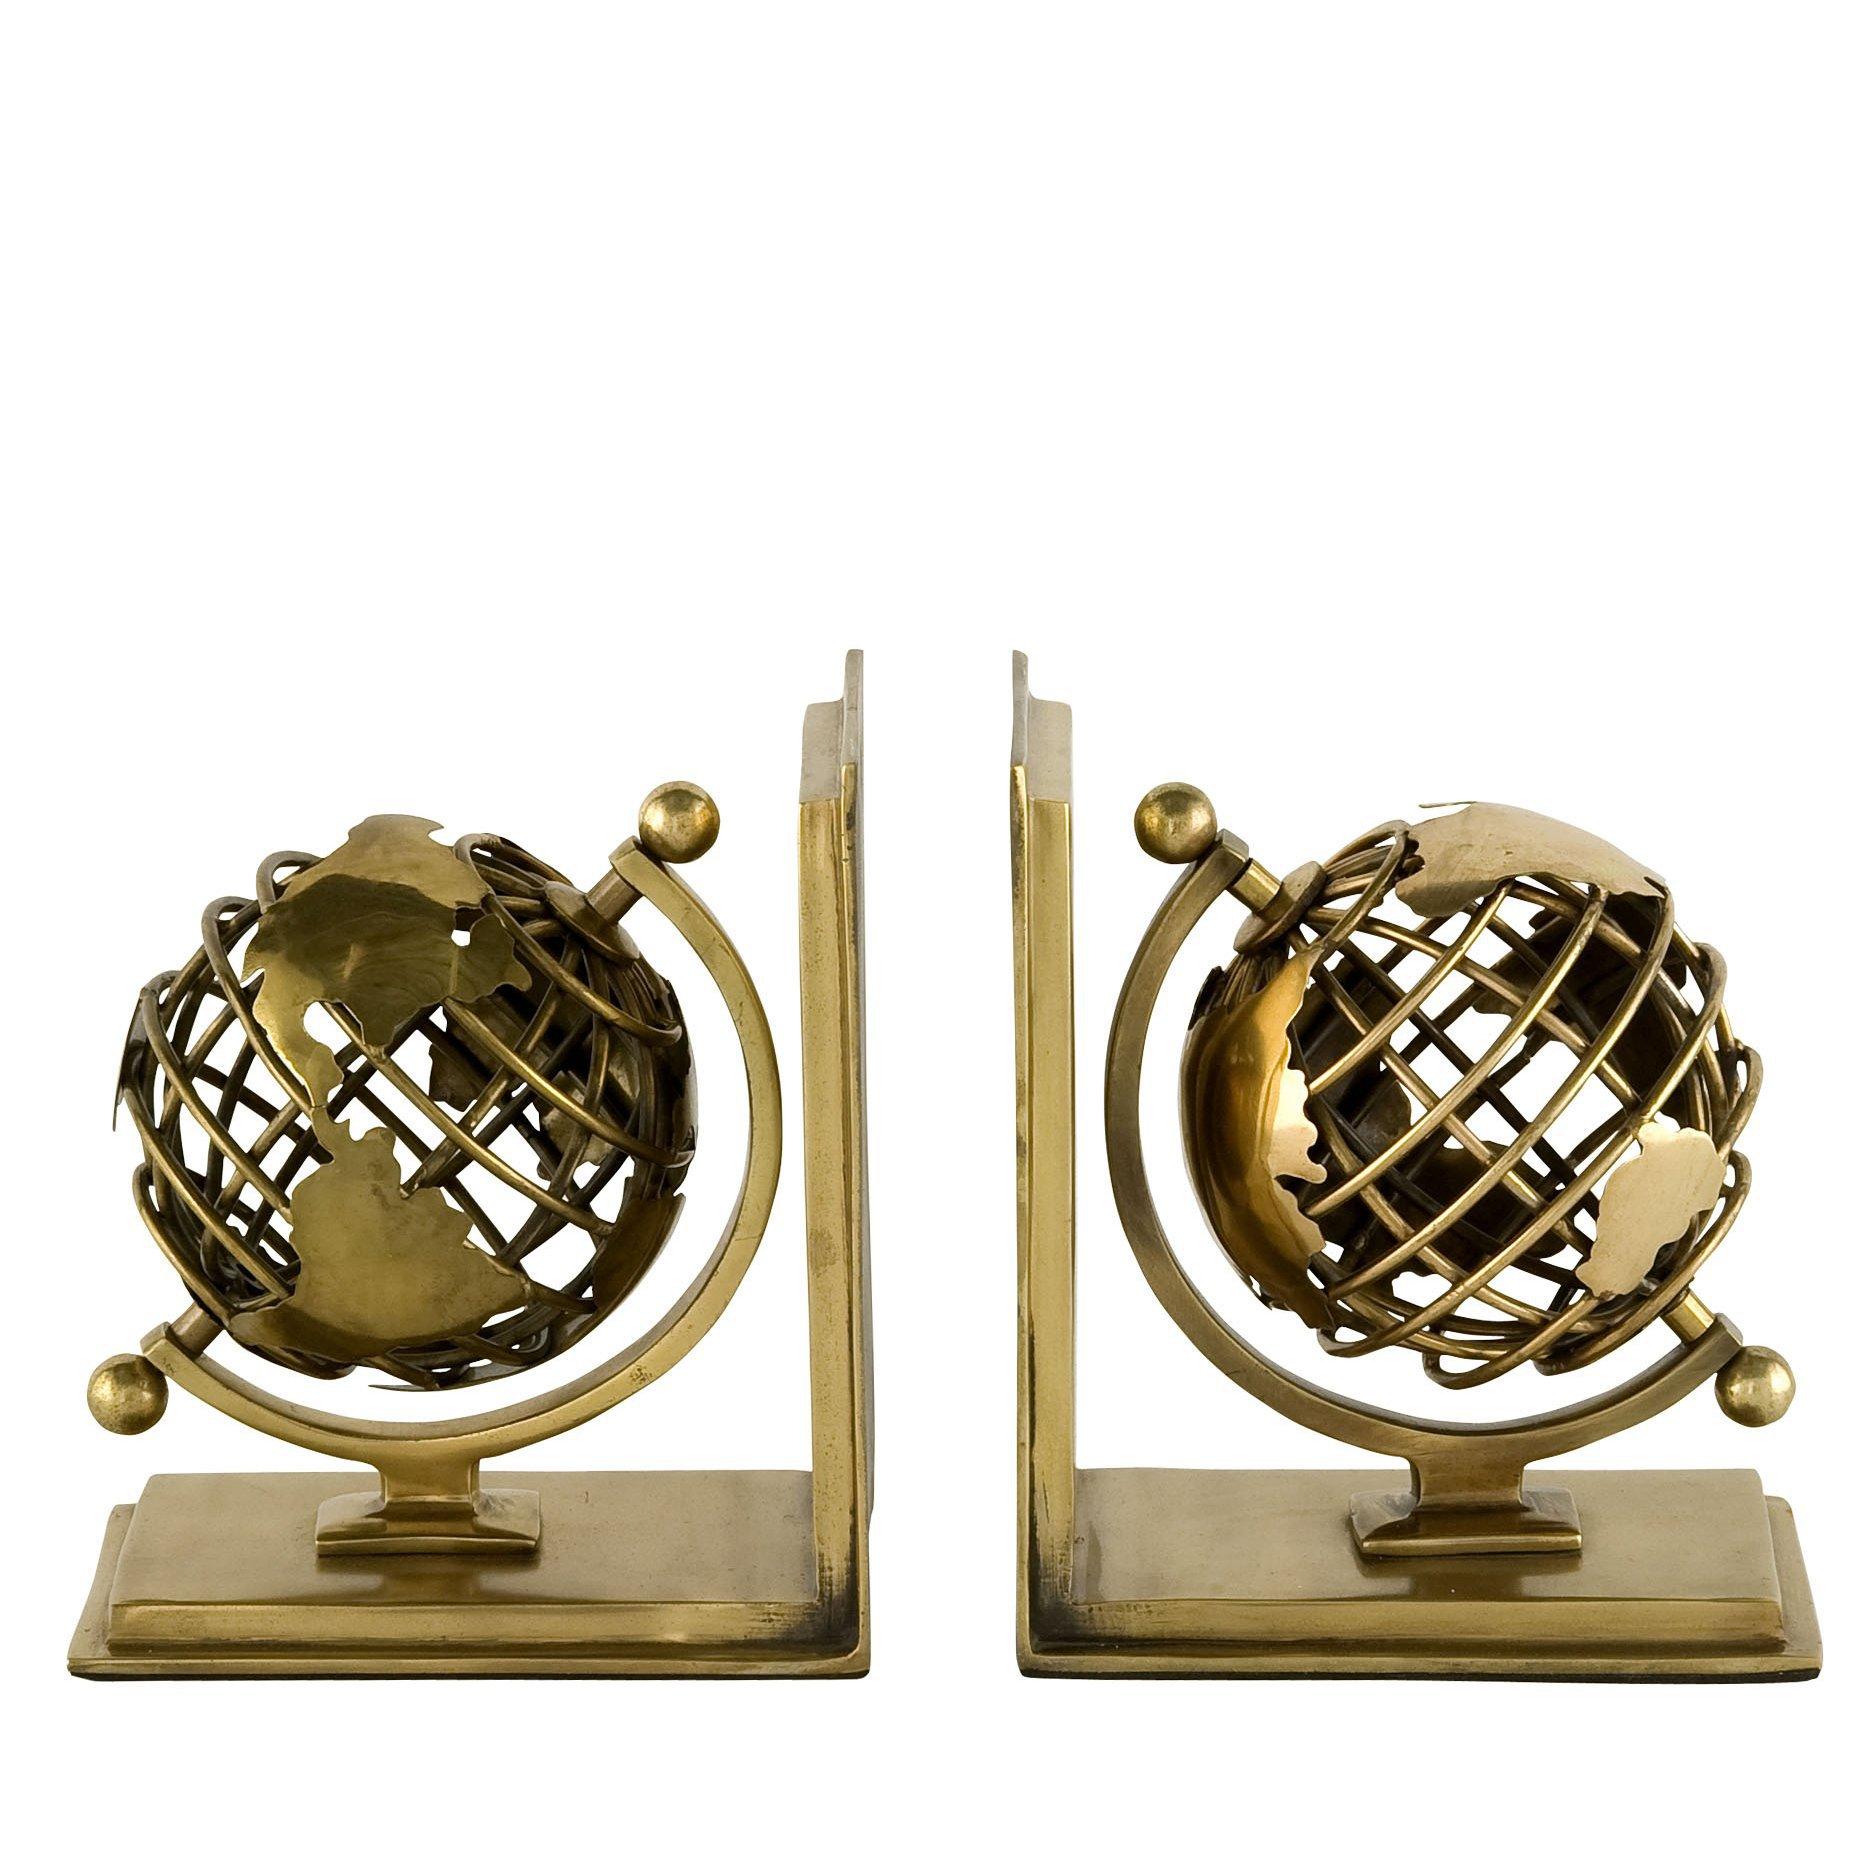 image-Eichholtz Bookend Globe set of 2 antique brass finish